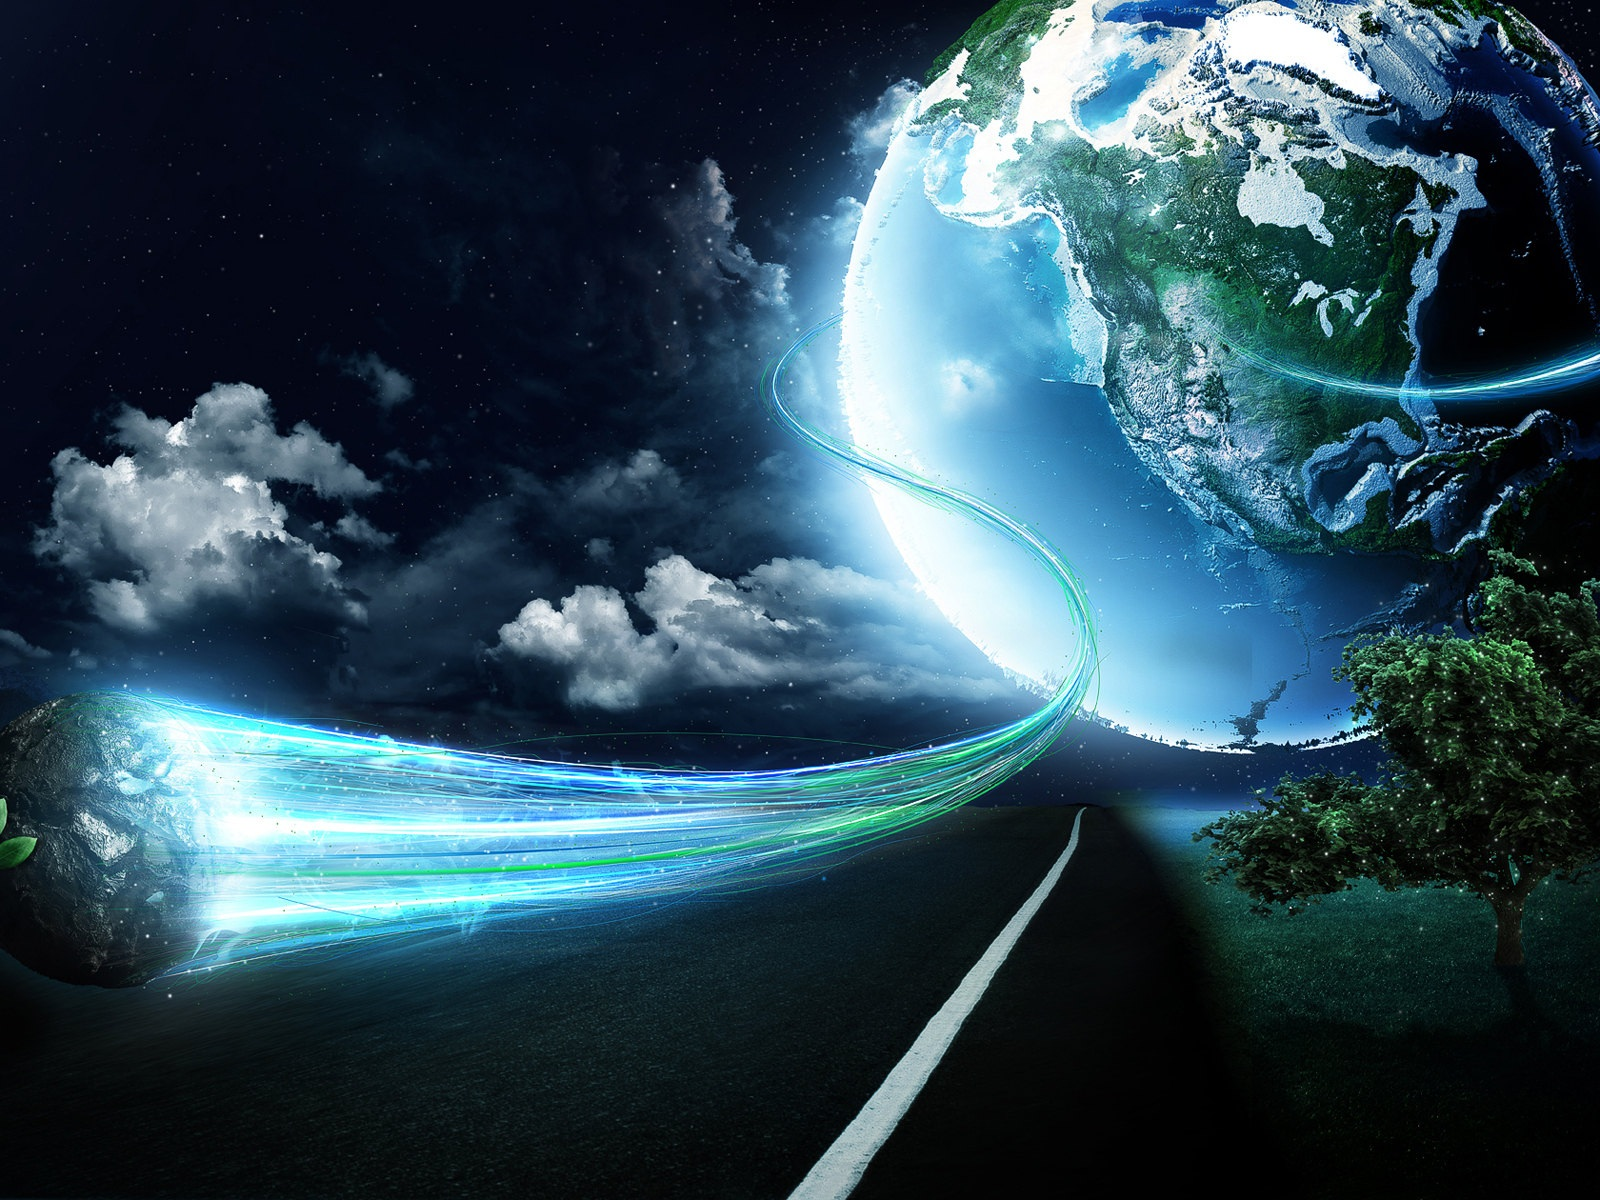 http://1.bp.blogspot.com/-u79rG-XITfQ/Ty5lGY-LPkI/AAAAAAAABGc/OlCYBF2Q_D4/s1600/Earth+%7Bfreehqwallpapers.blogspot.com%7D+%2818%29.jpg